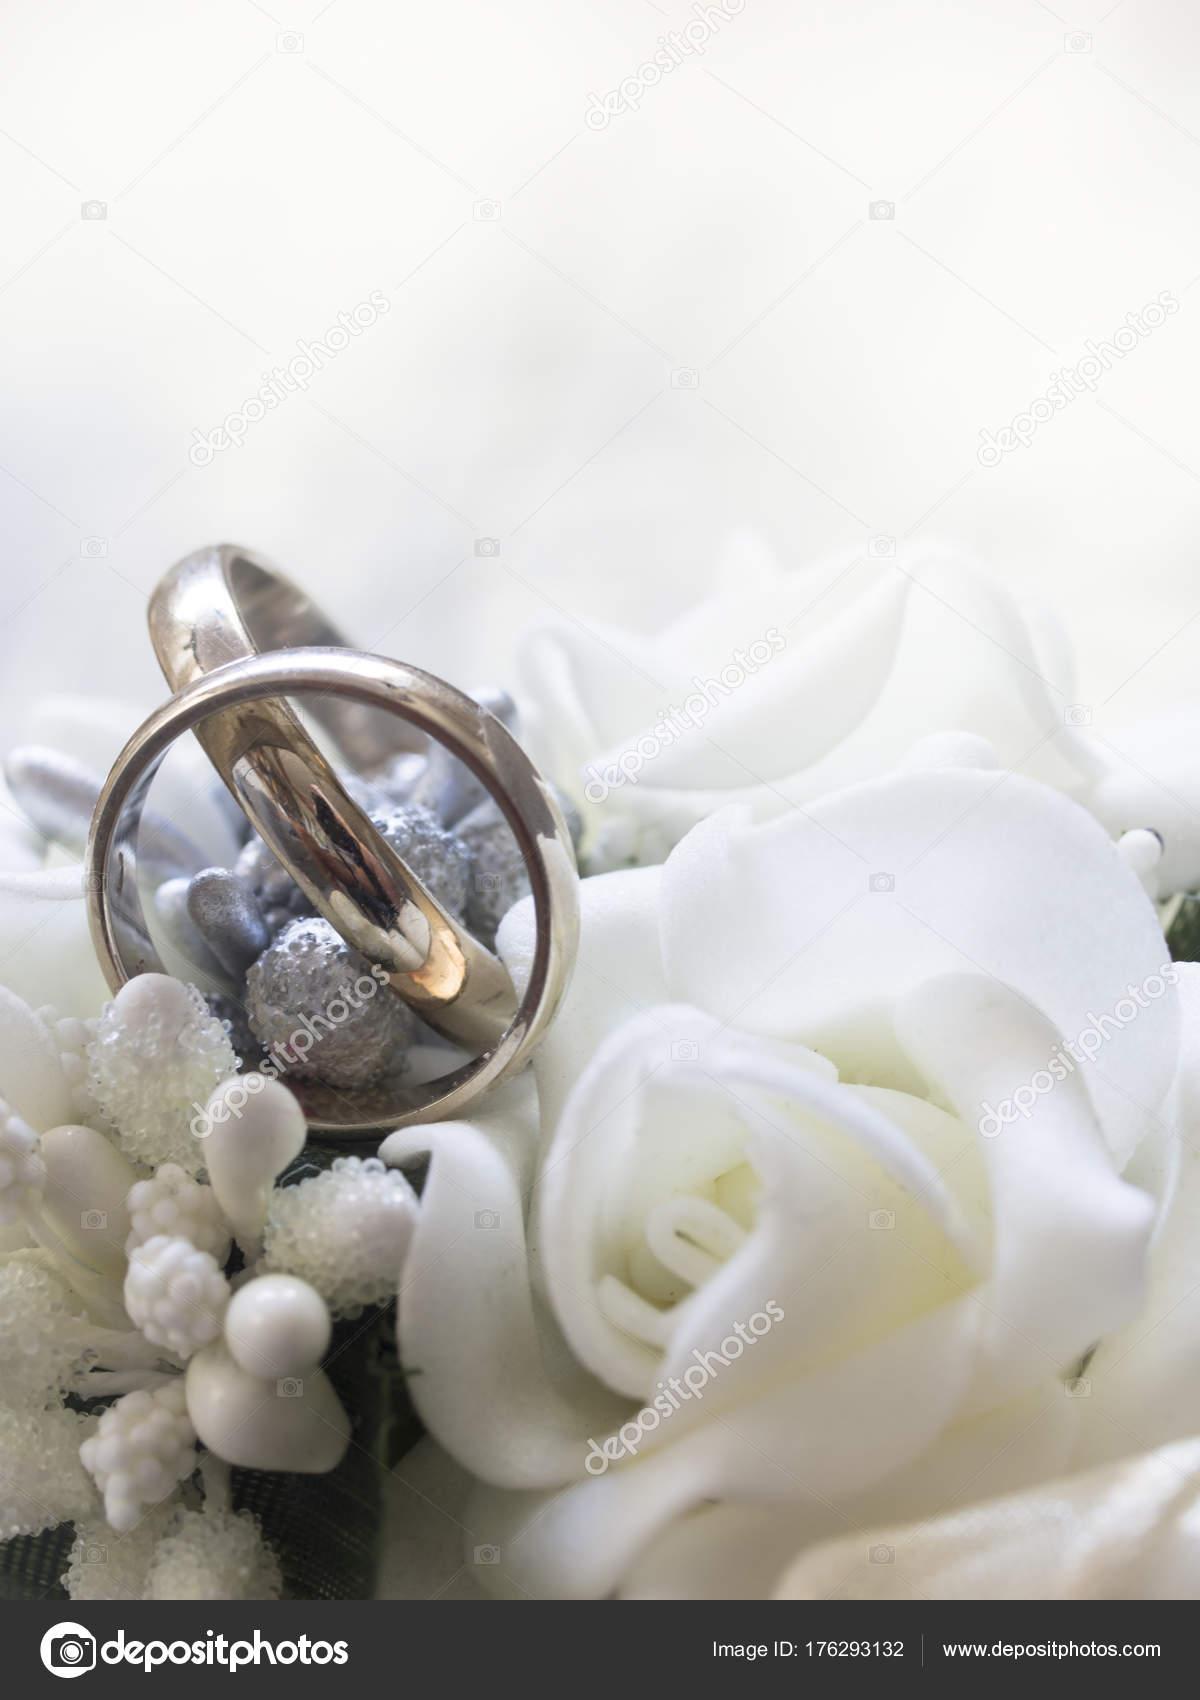 Goldene Hochzeit Ringe Mit Schoner Dekoration Stockfoto C Vesnac